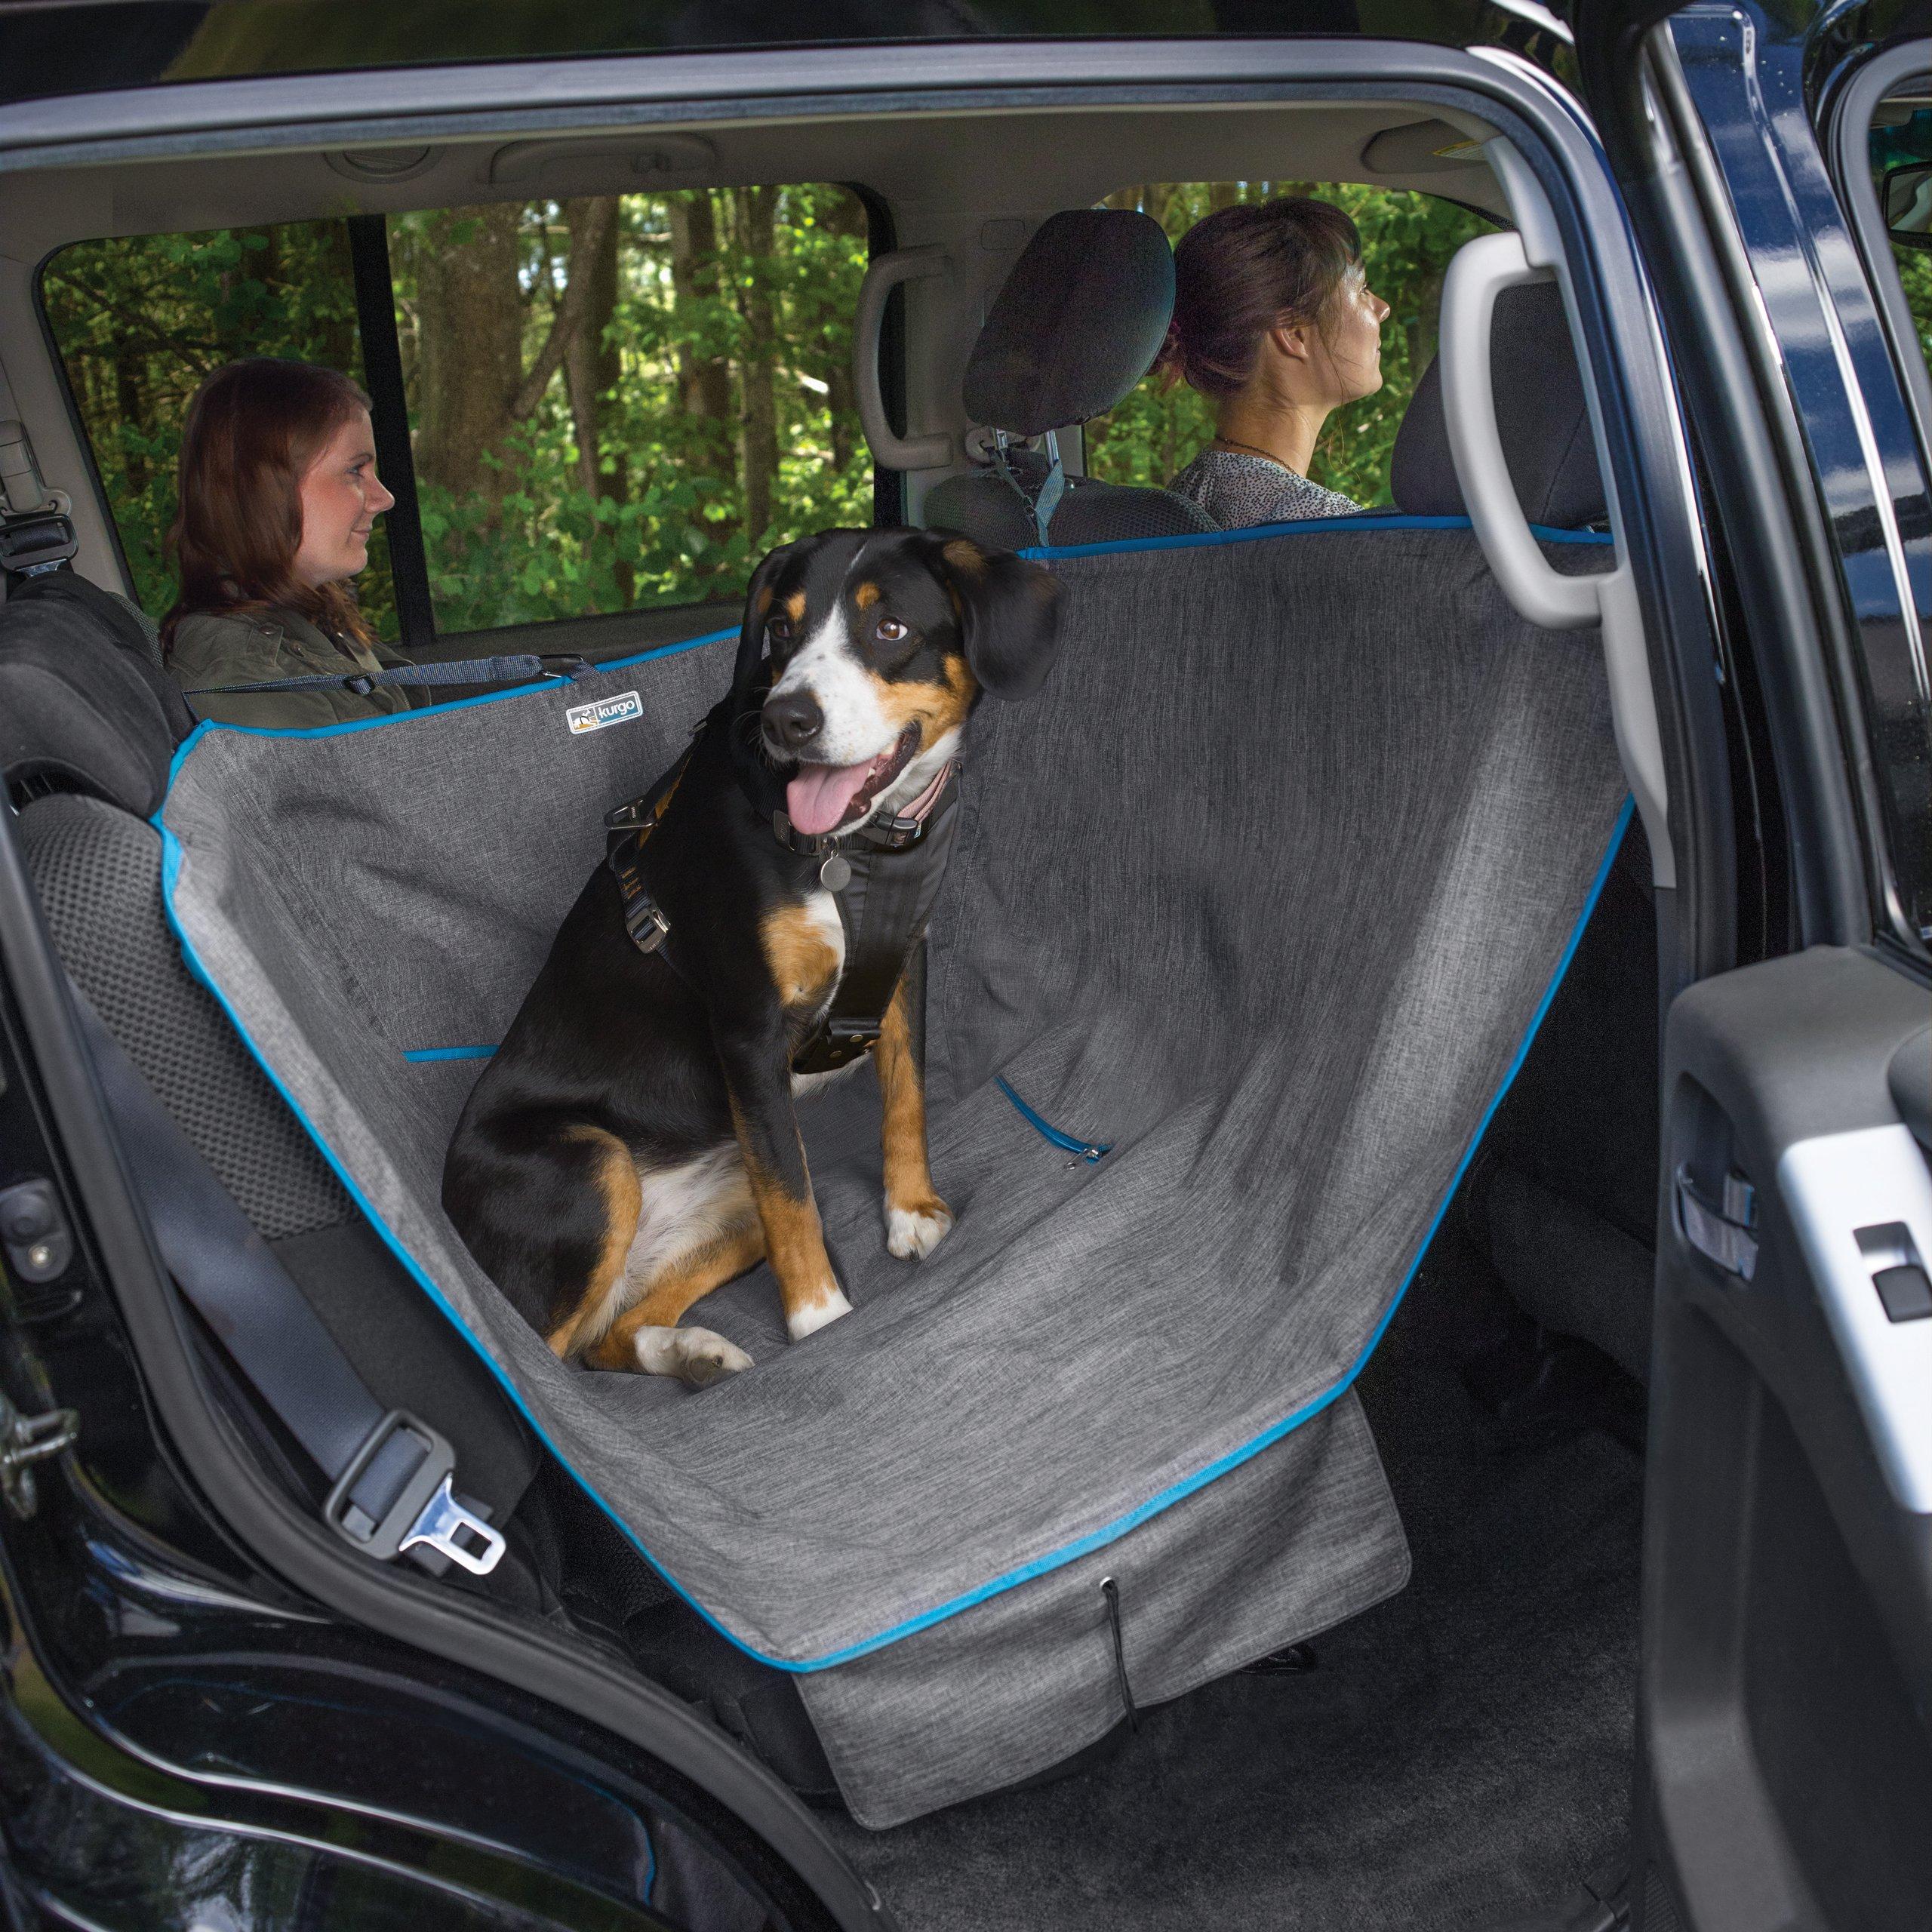 Kurgo Wander Dog Hammock Style Seat Cover for Pets, Pet Seat Cover, Dog Car Hammock - Water-Resistant, Khaki by Kurgo